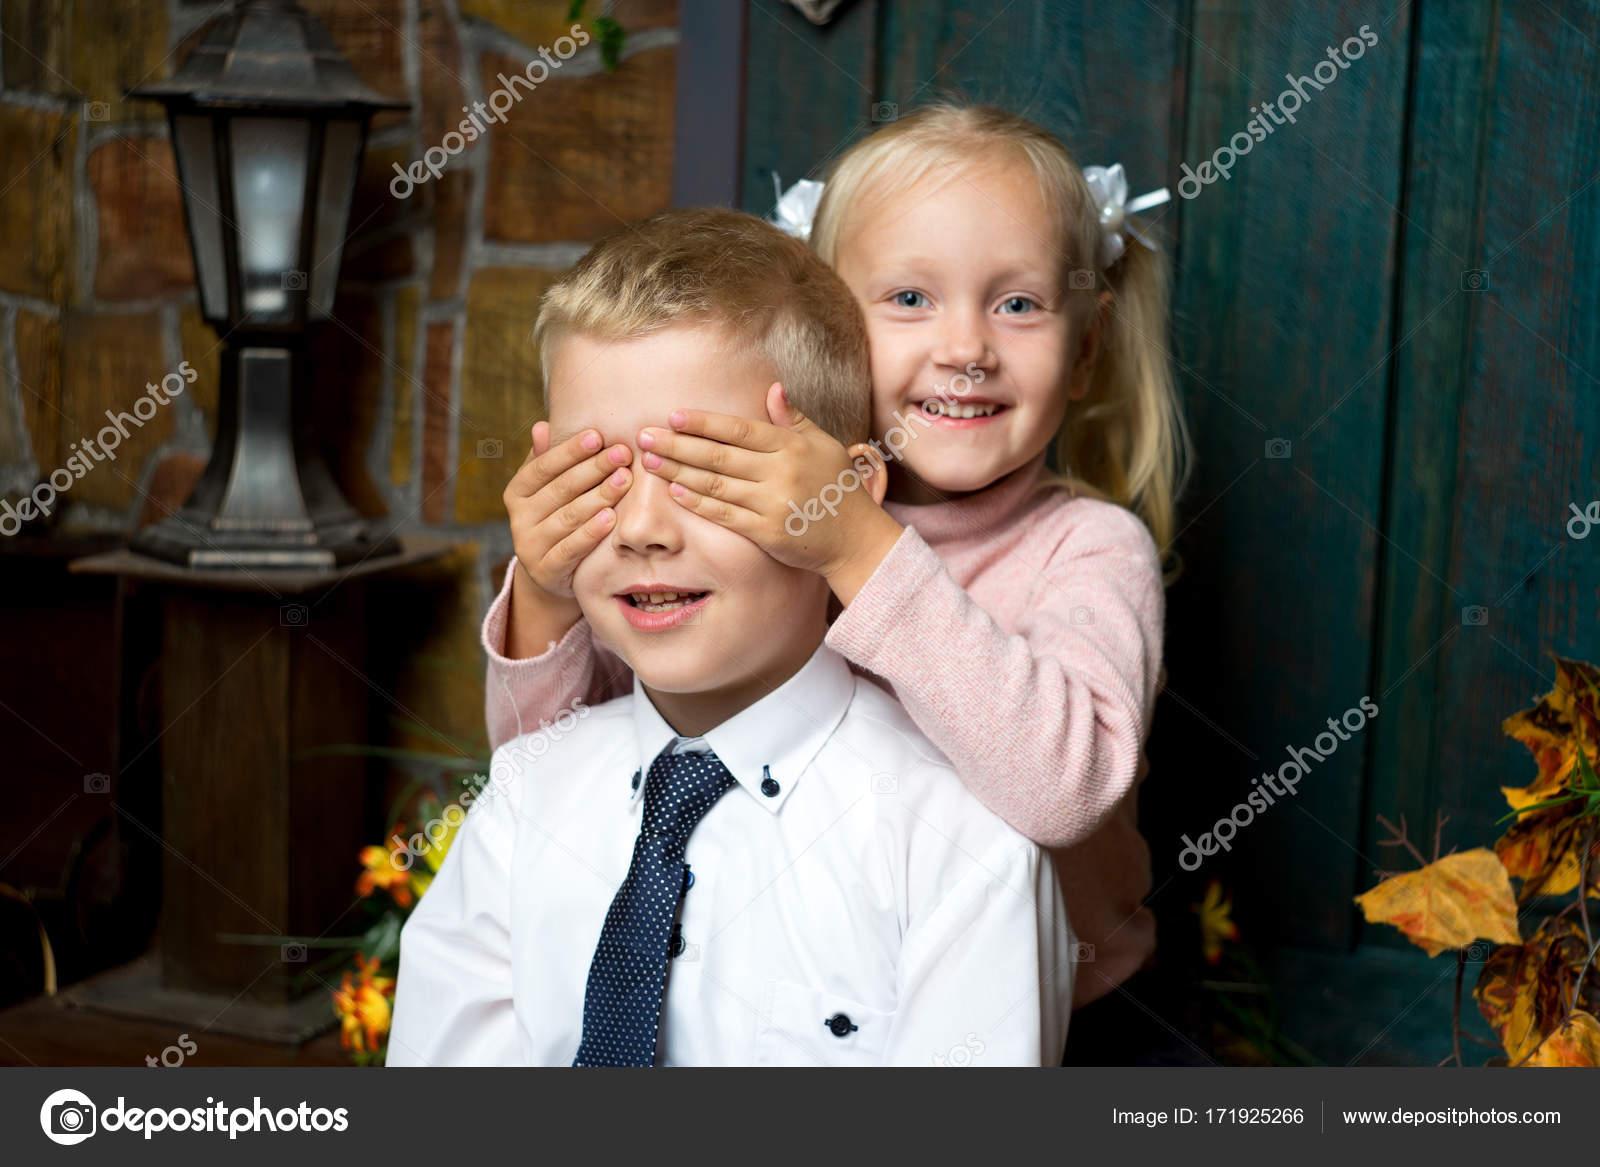 08e61c4d298 αγόρι κορίτσι παιδιά — Φωτογραφία Αρχείου © OlgaOsa #171925266